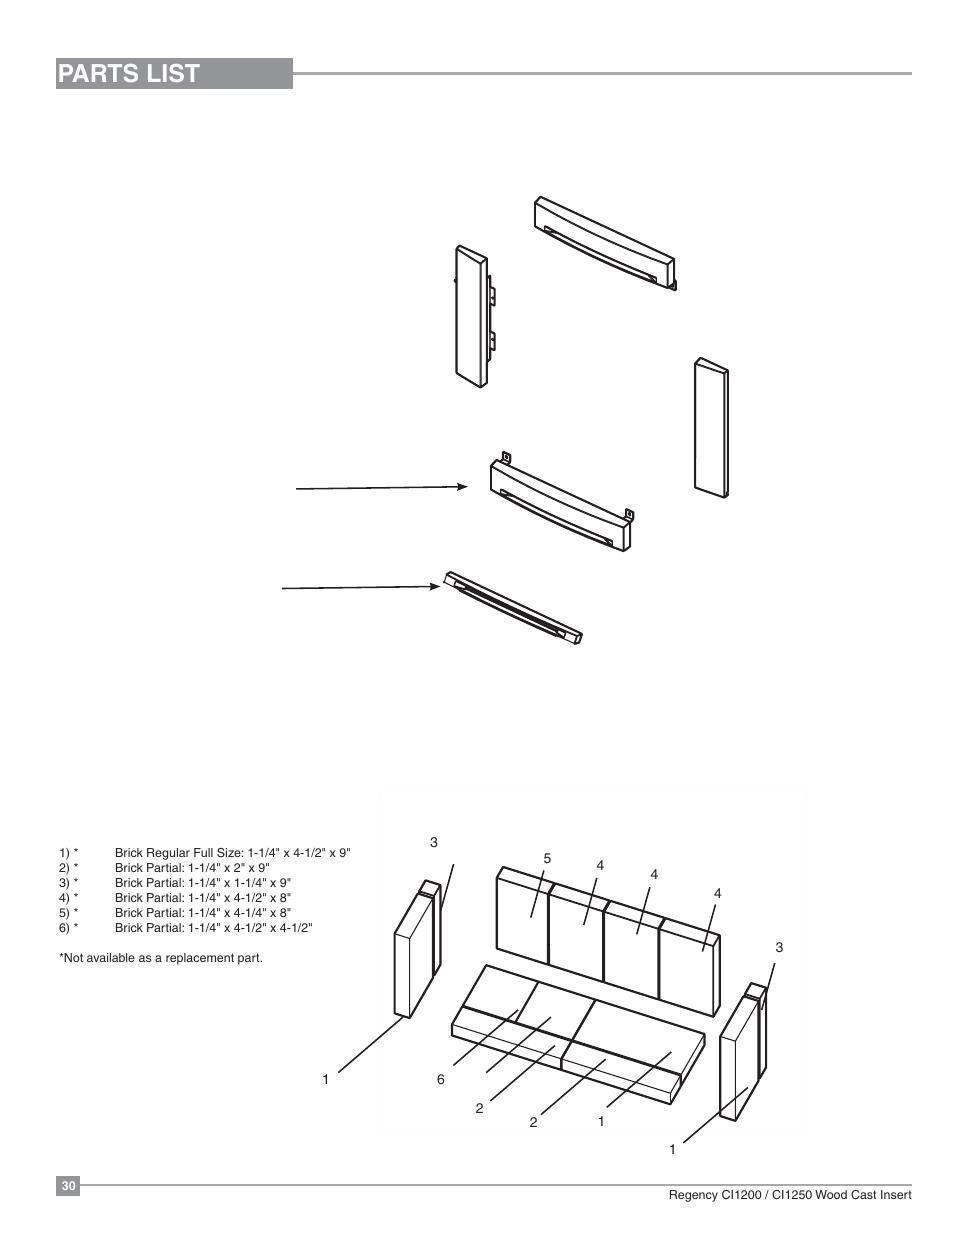 hight resolution of parts list cast faceplate firebrick regency alterra ci1250 small wood insert user manual page 30 32